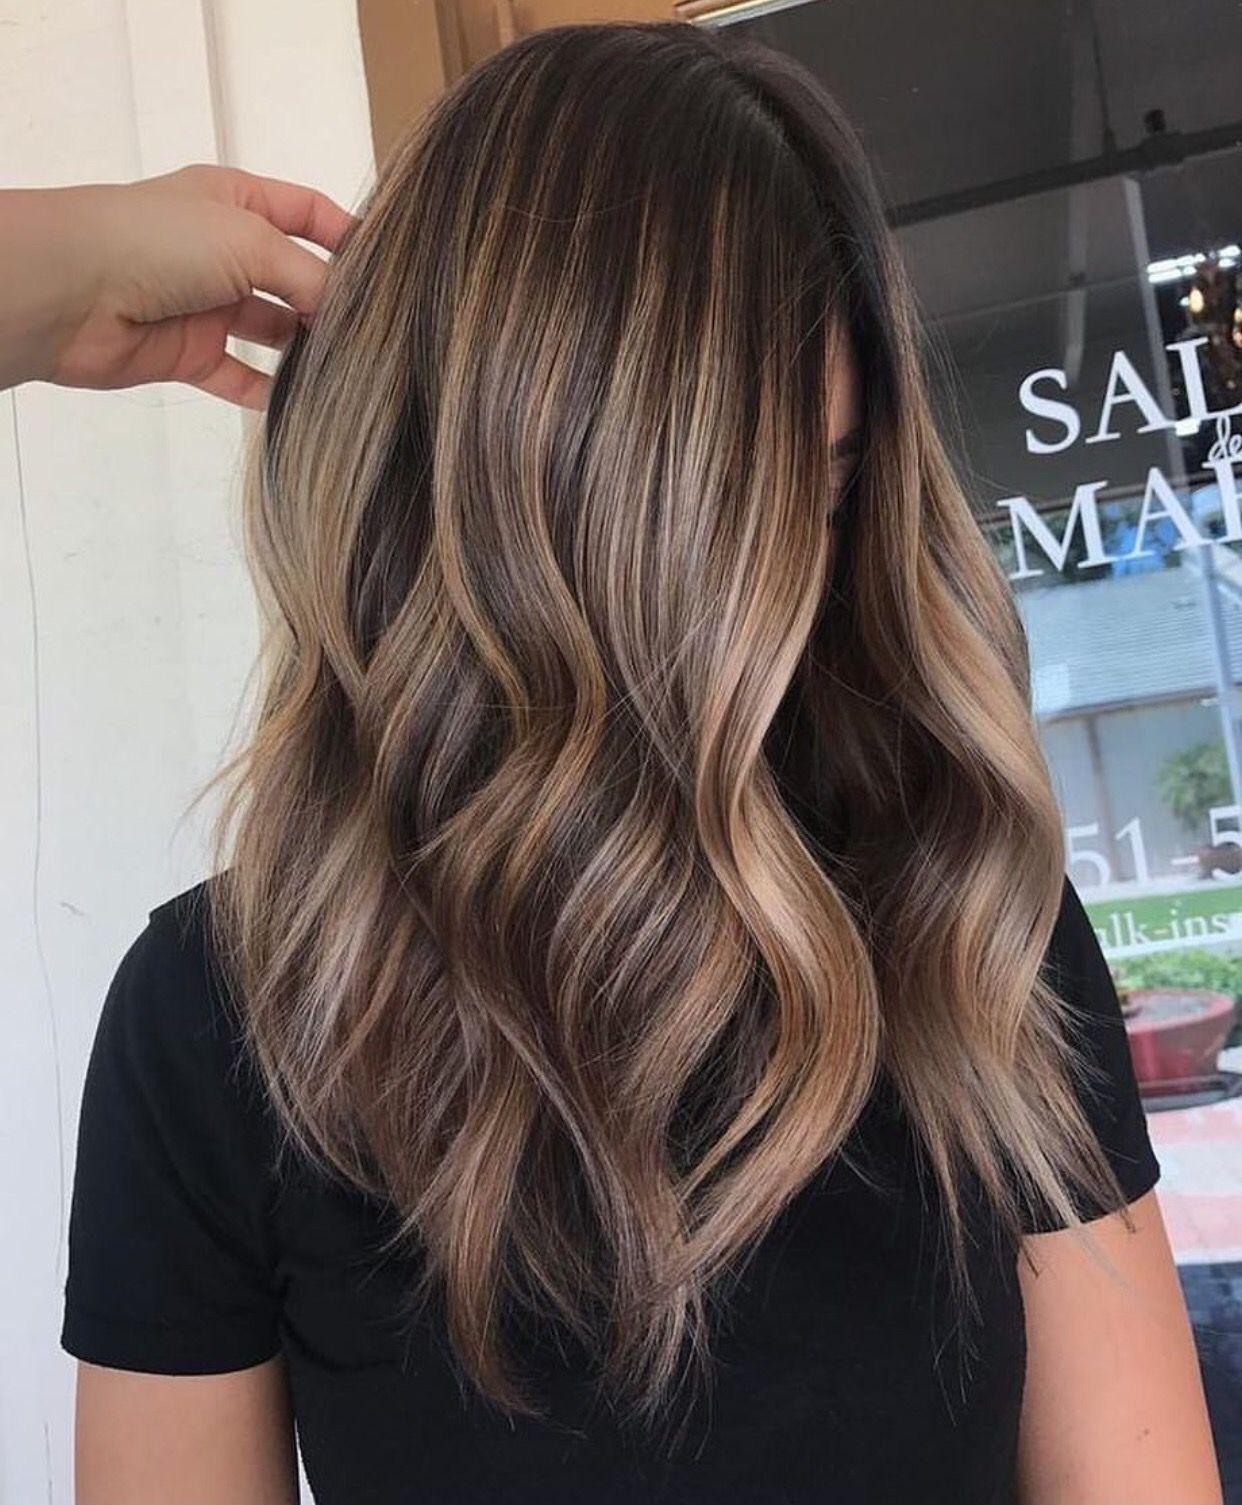 Brown and silver hair pinterest florriemorrie00 hair trendy hair highlights 40 amazing short hairstyles for medium hair pmusecretfo Gallery